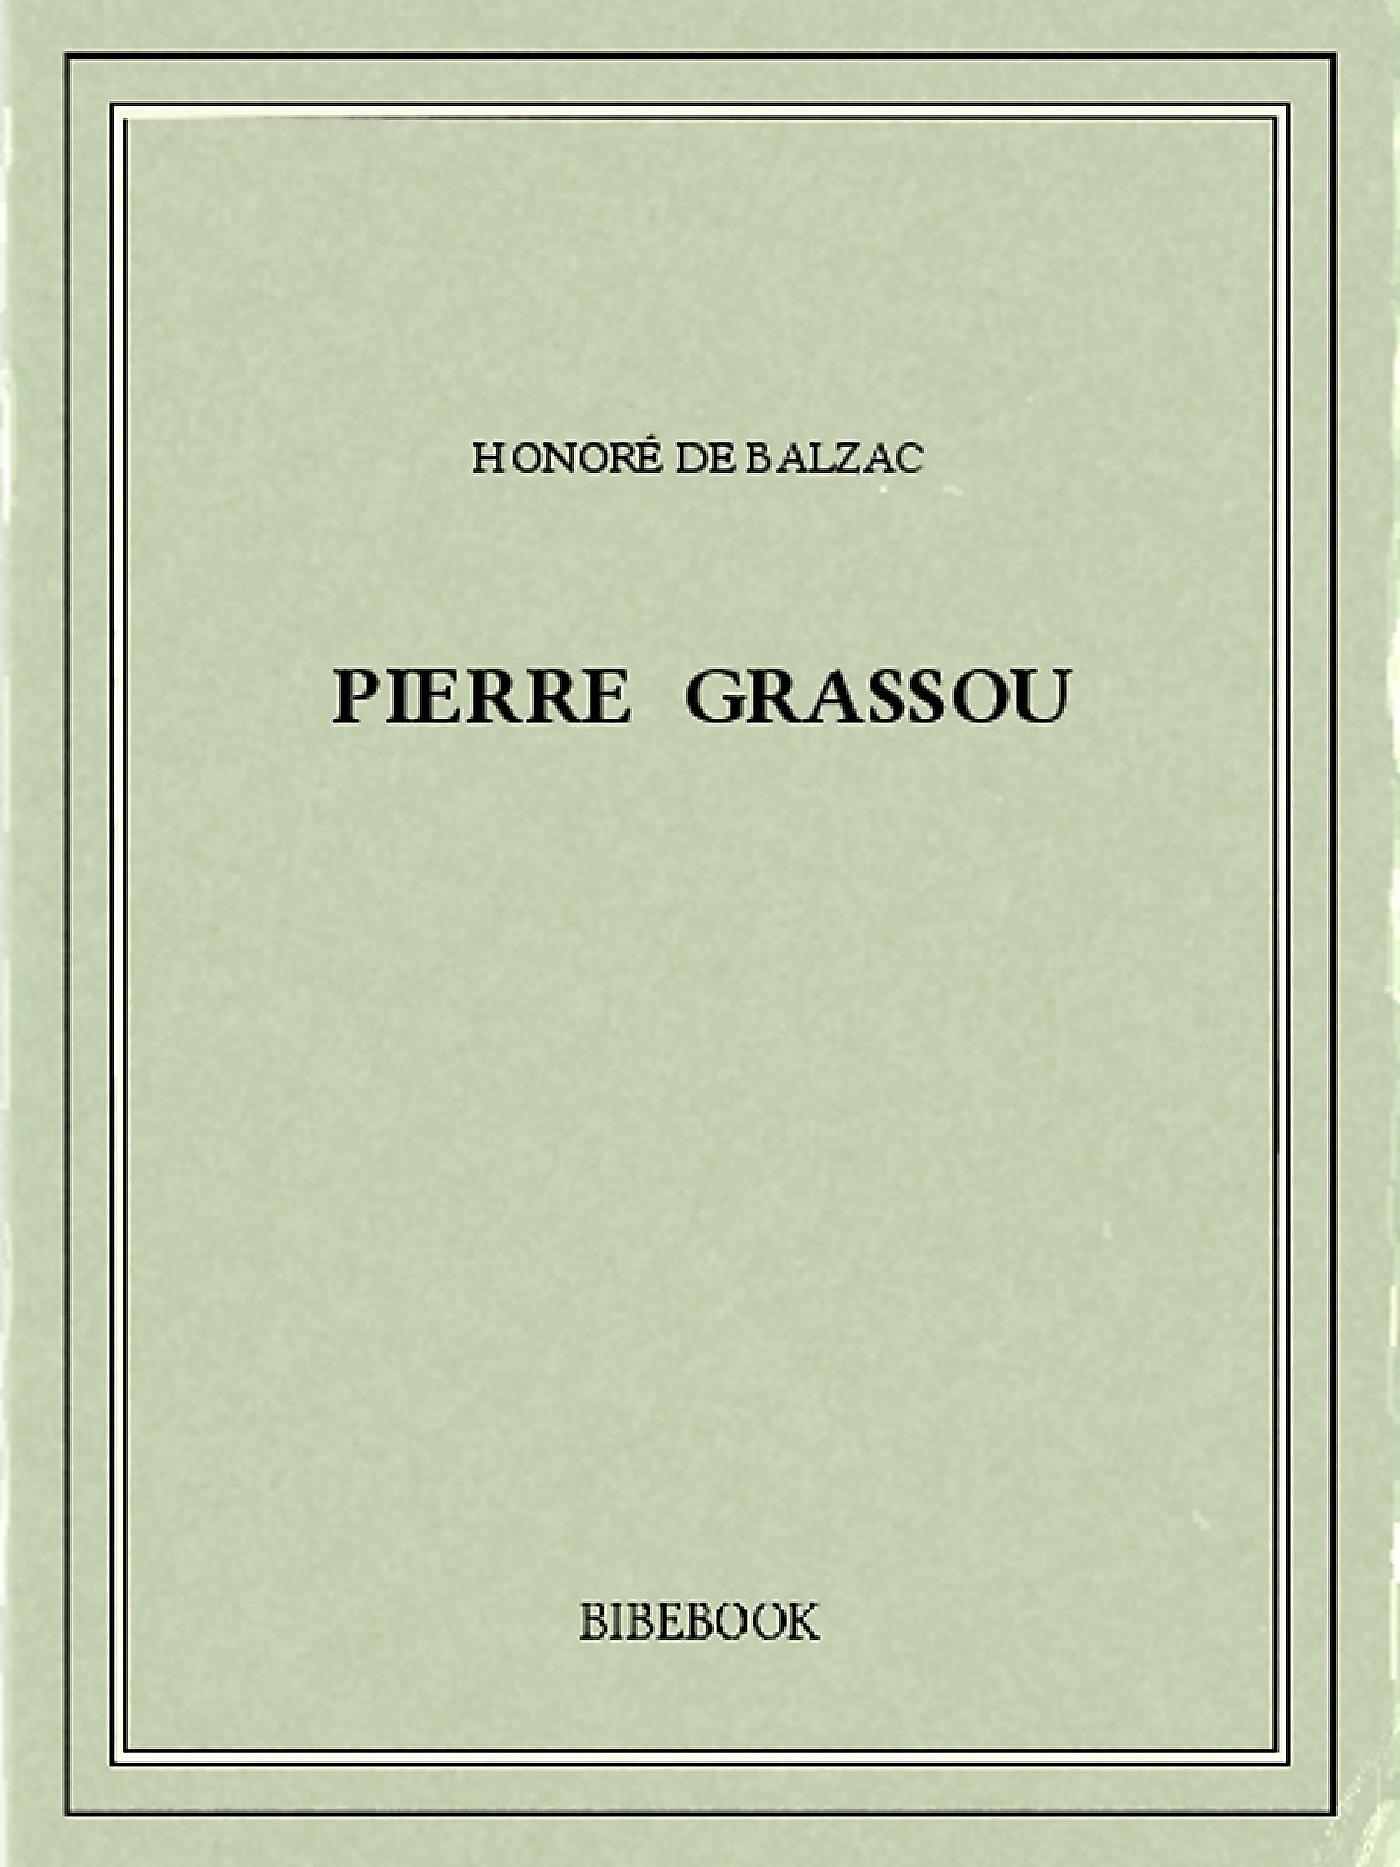 Pierre Grassou